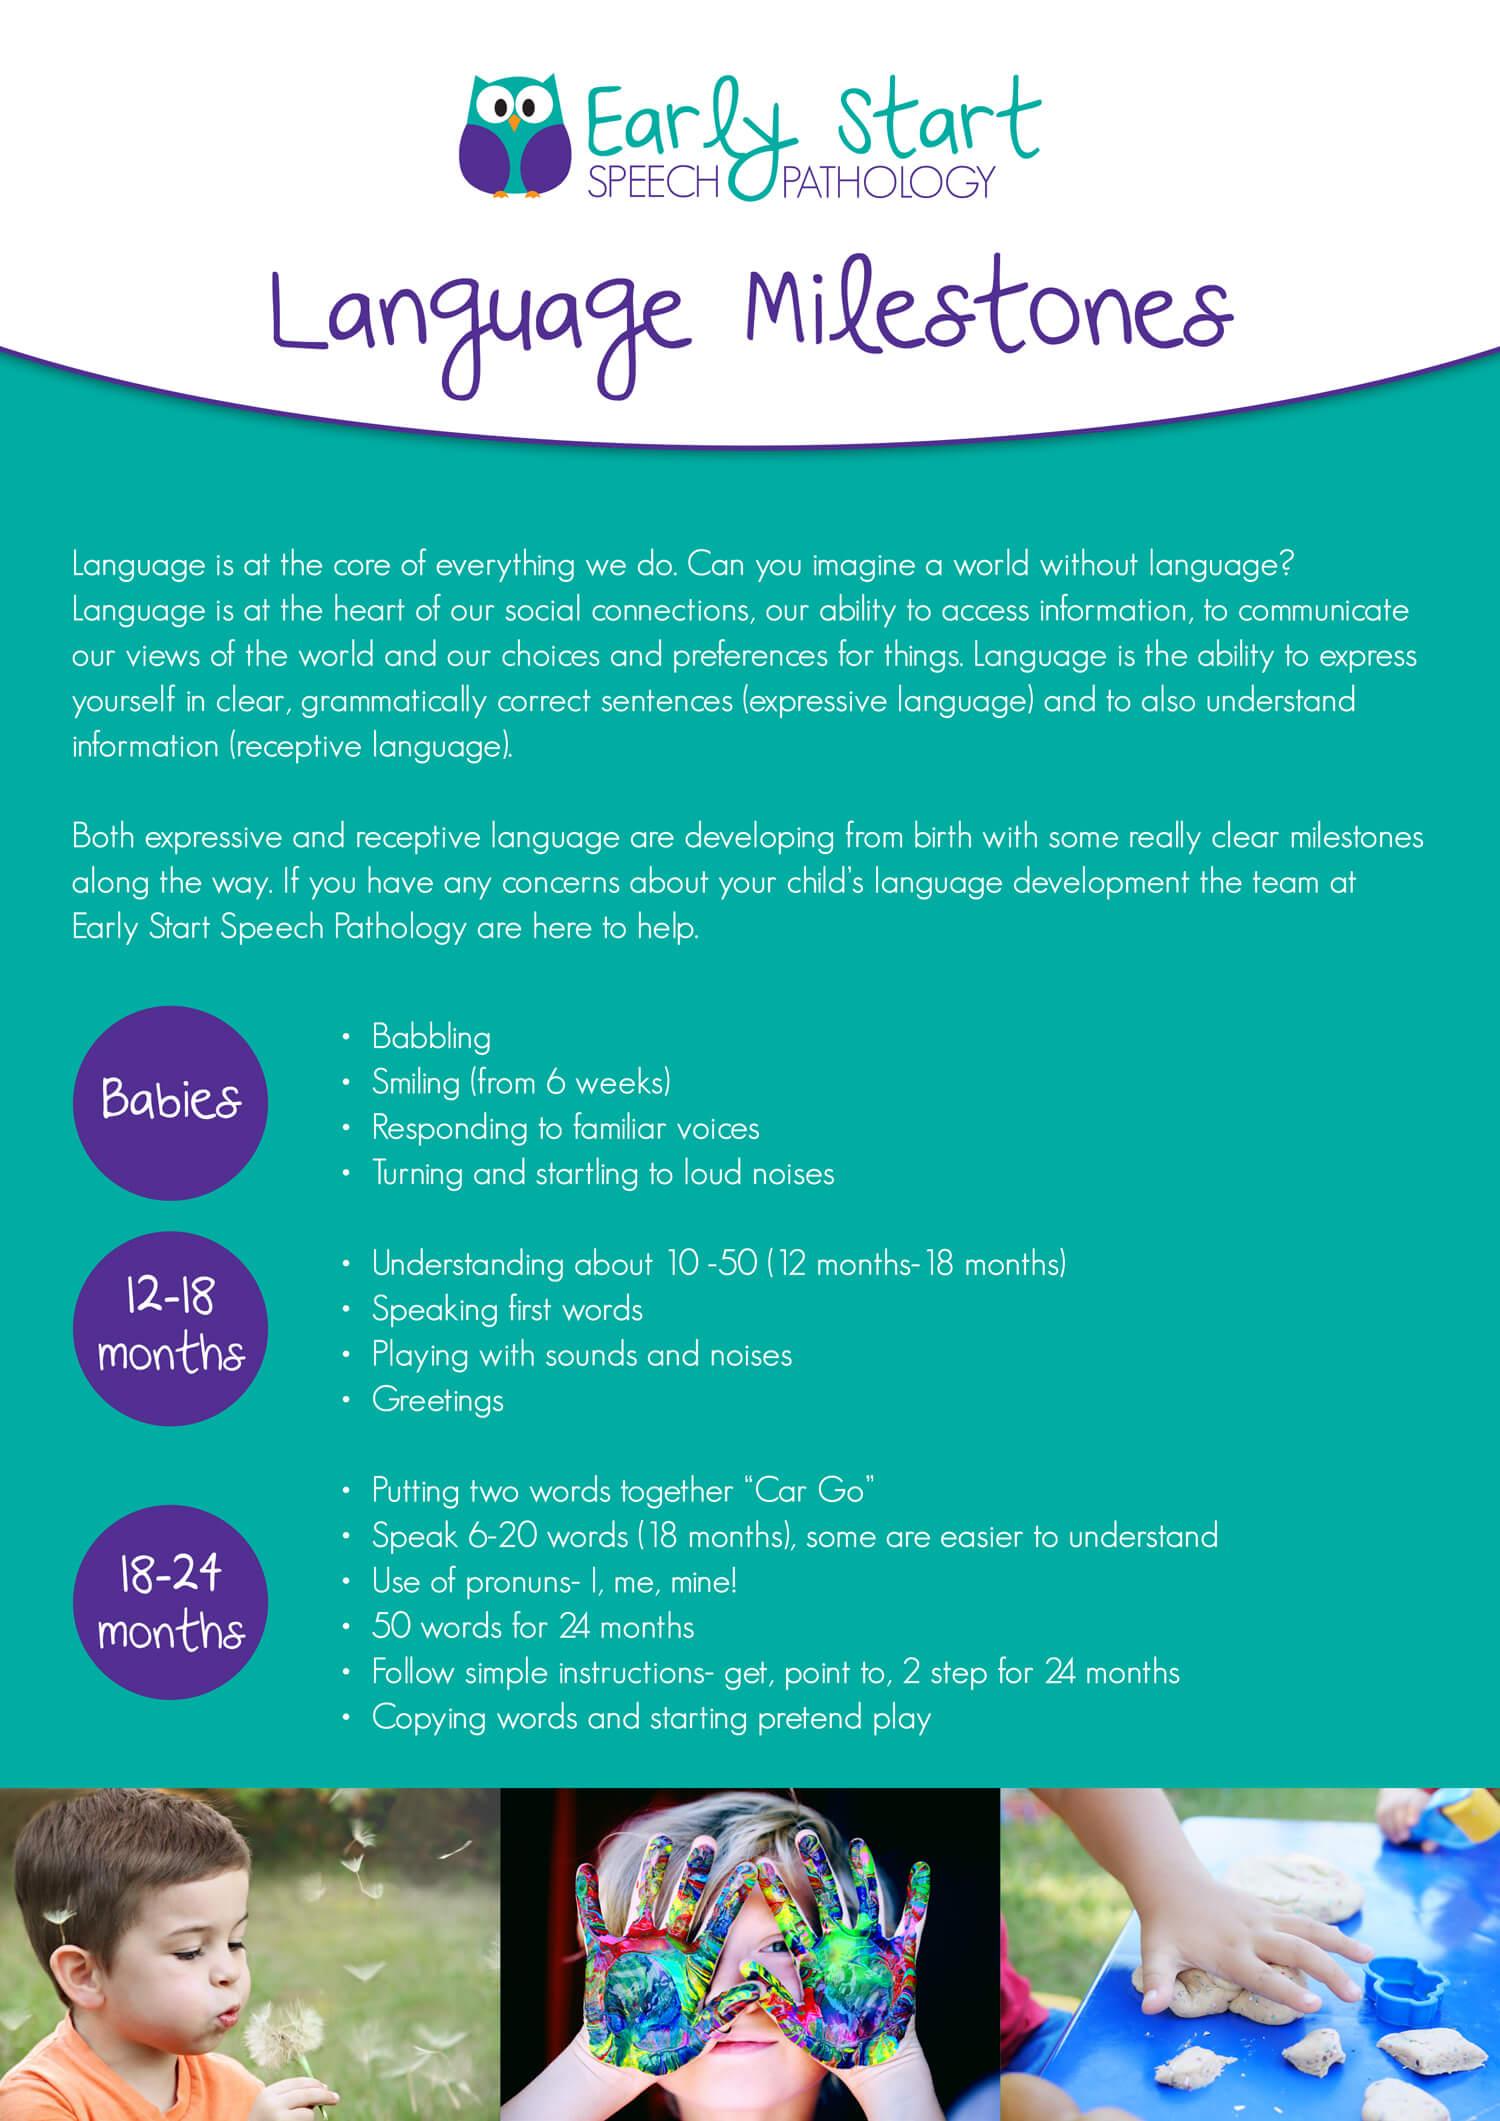 Early Start Language Milestones